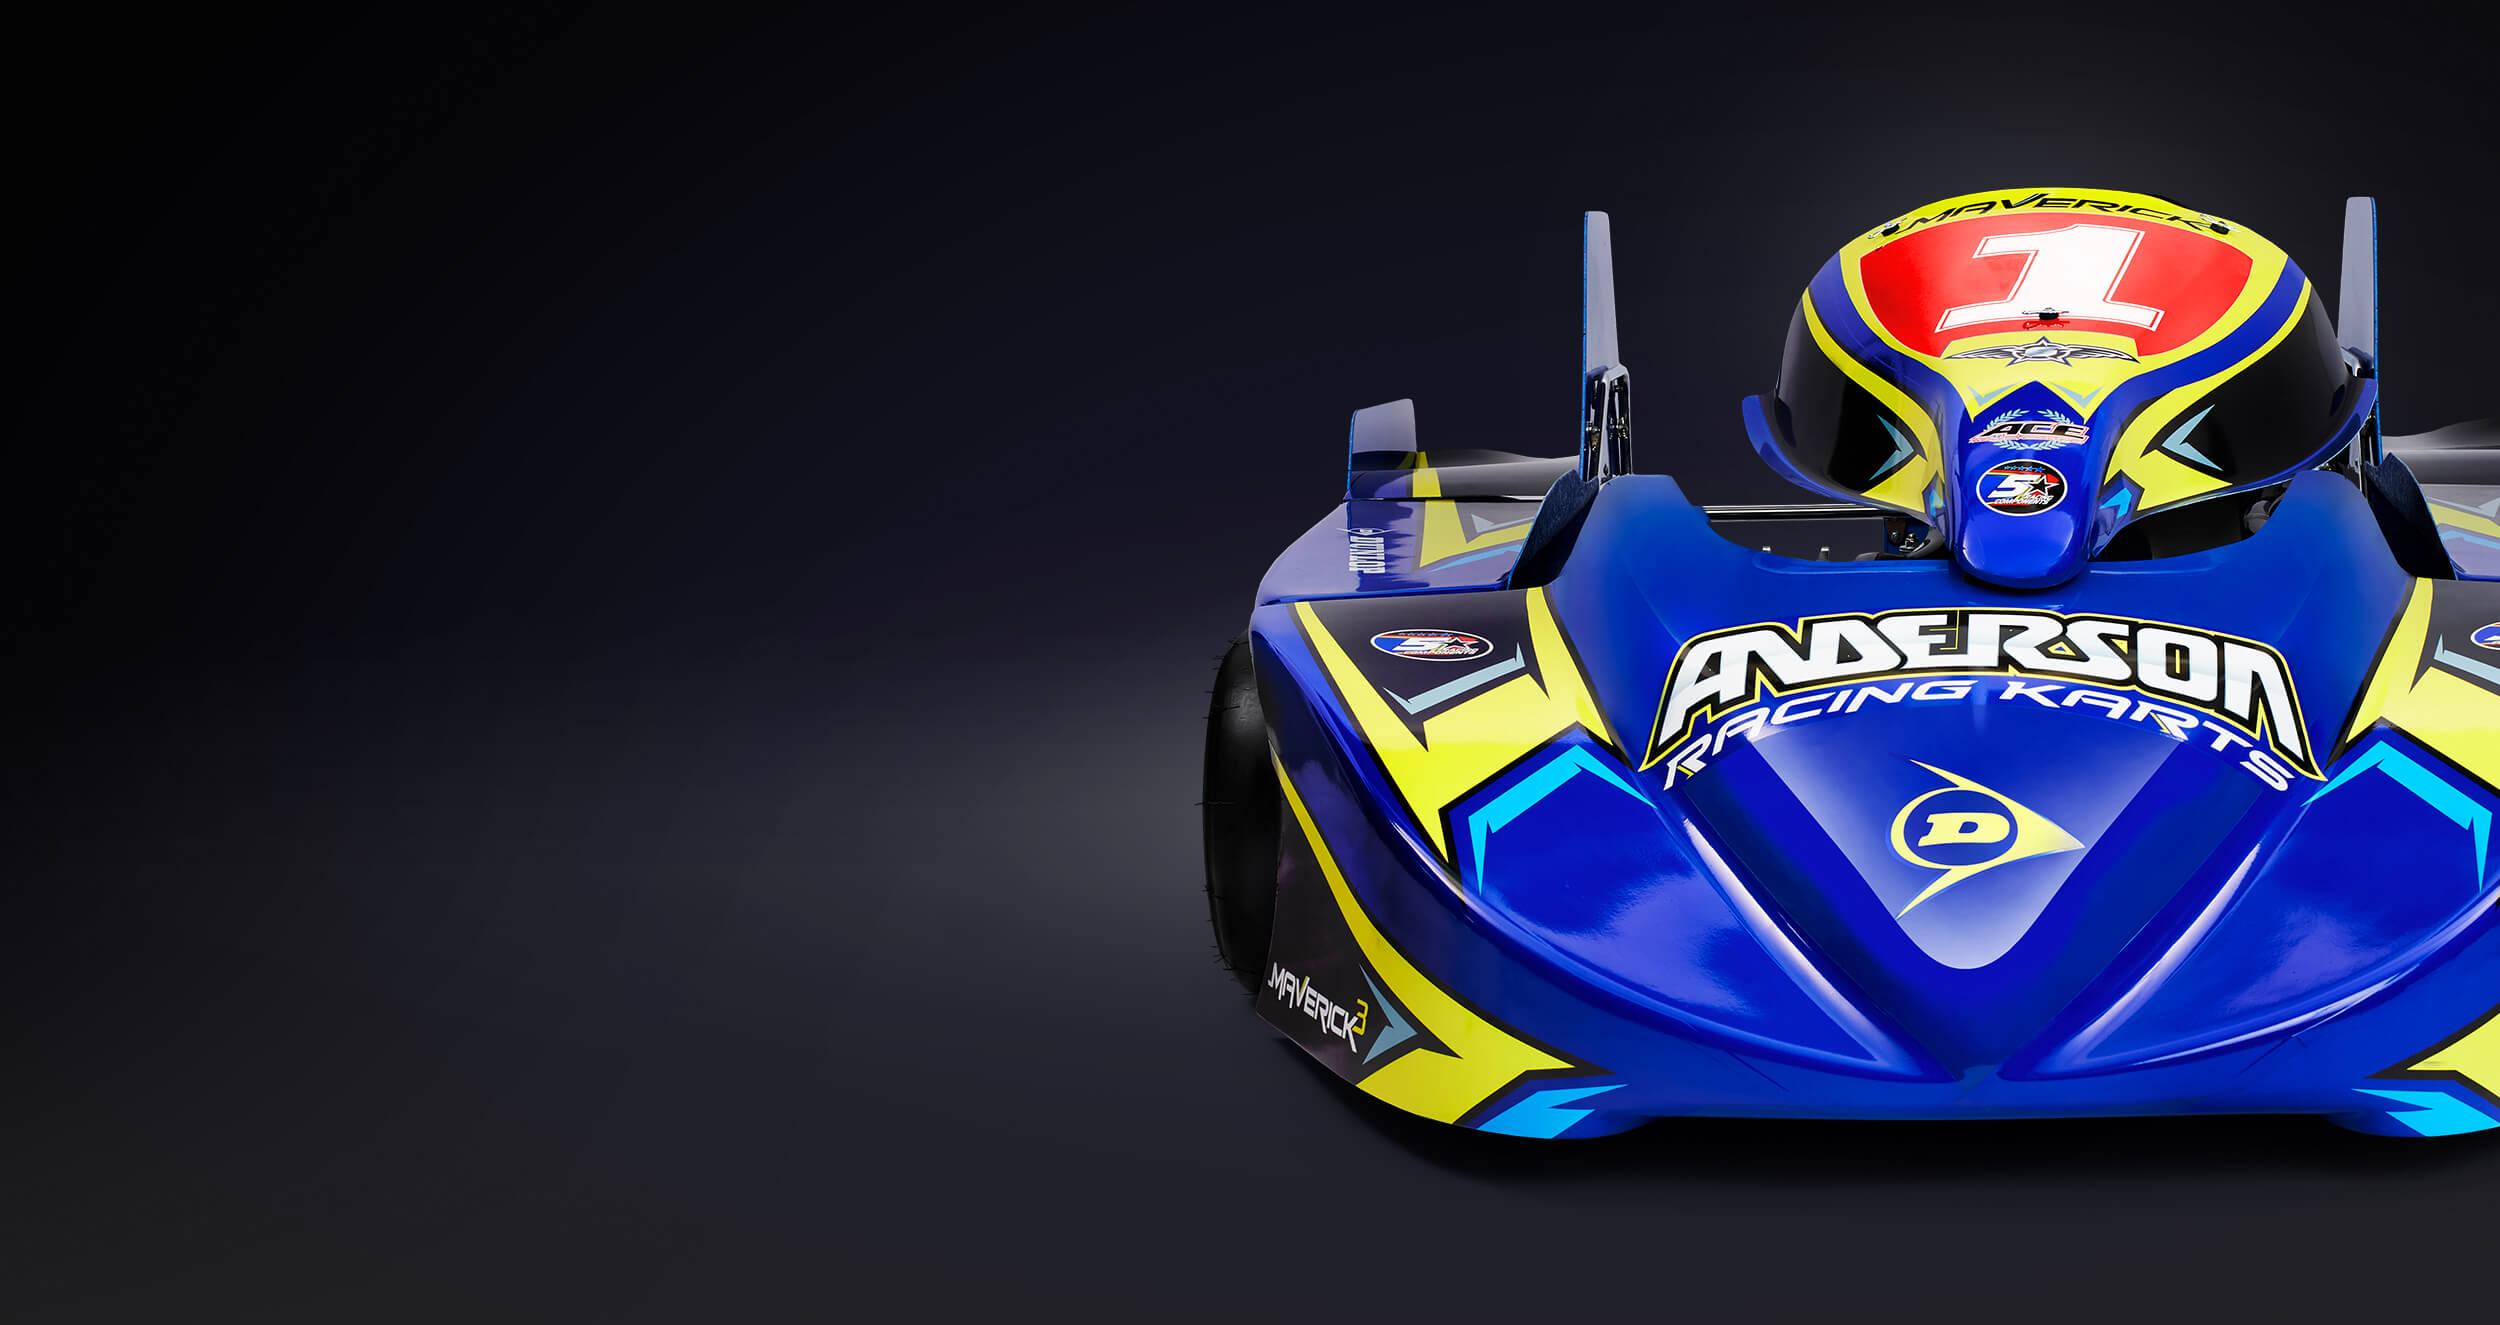 Anderson Karts Marverick 3 125 Long Circuit Superkart